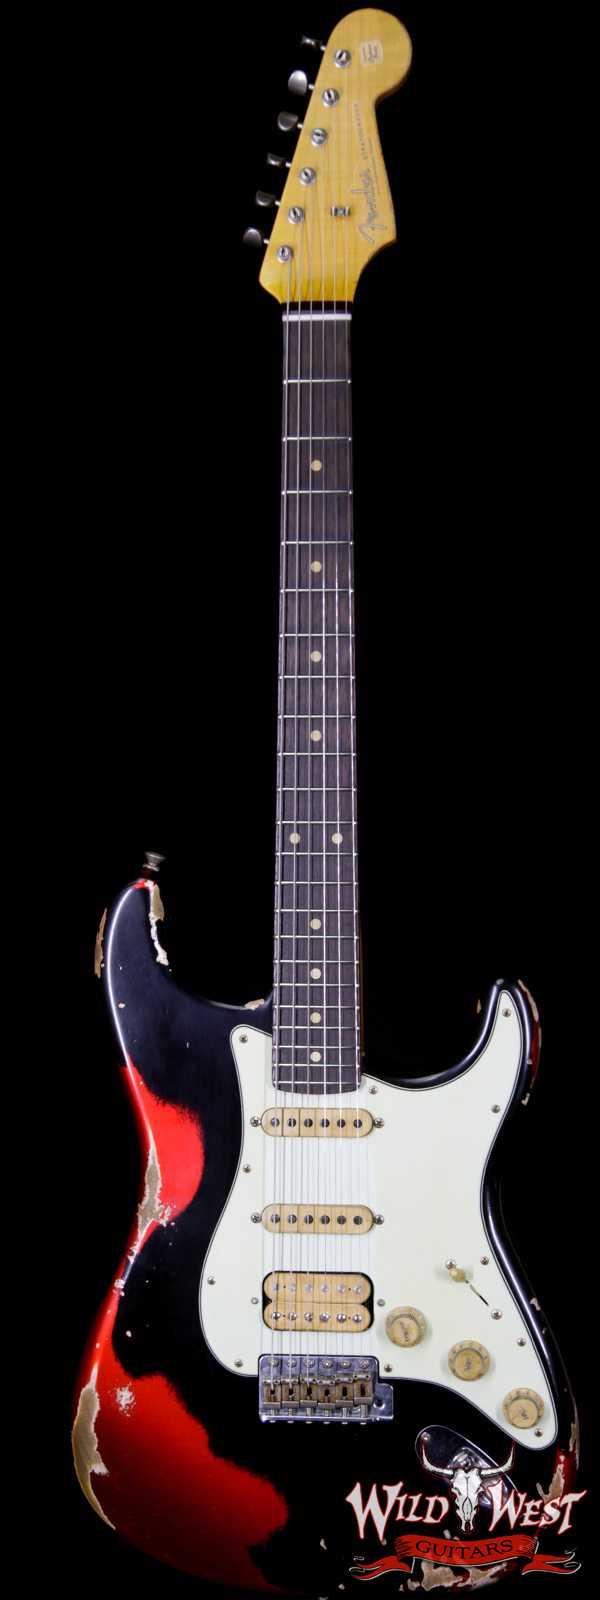 Fender Custom Shop Black Lightning 2.0 Stratocaster Heavy Relic HSS 22 Frets Rosewood Board Candy Apple Red